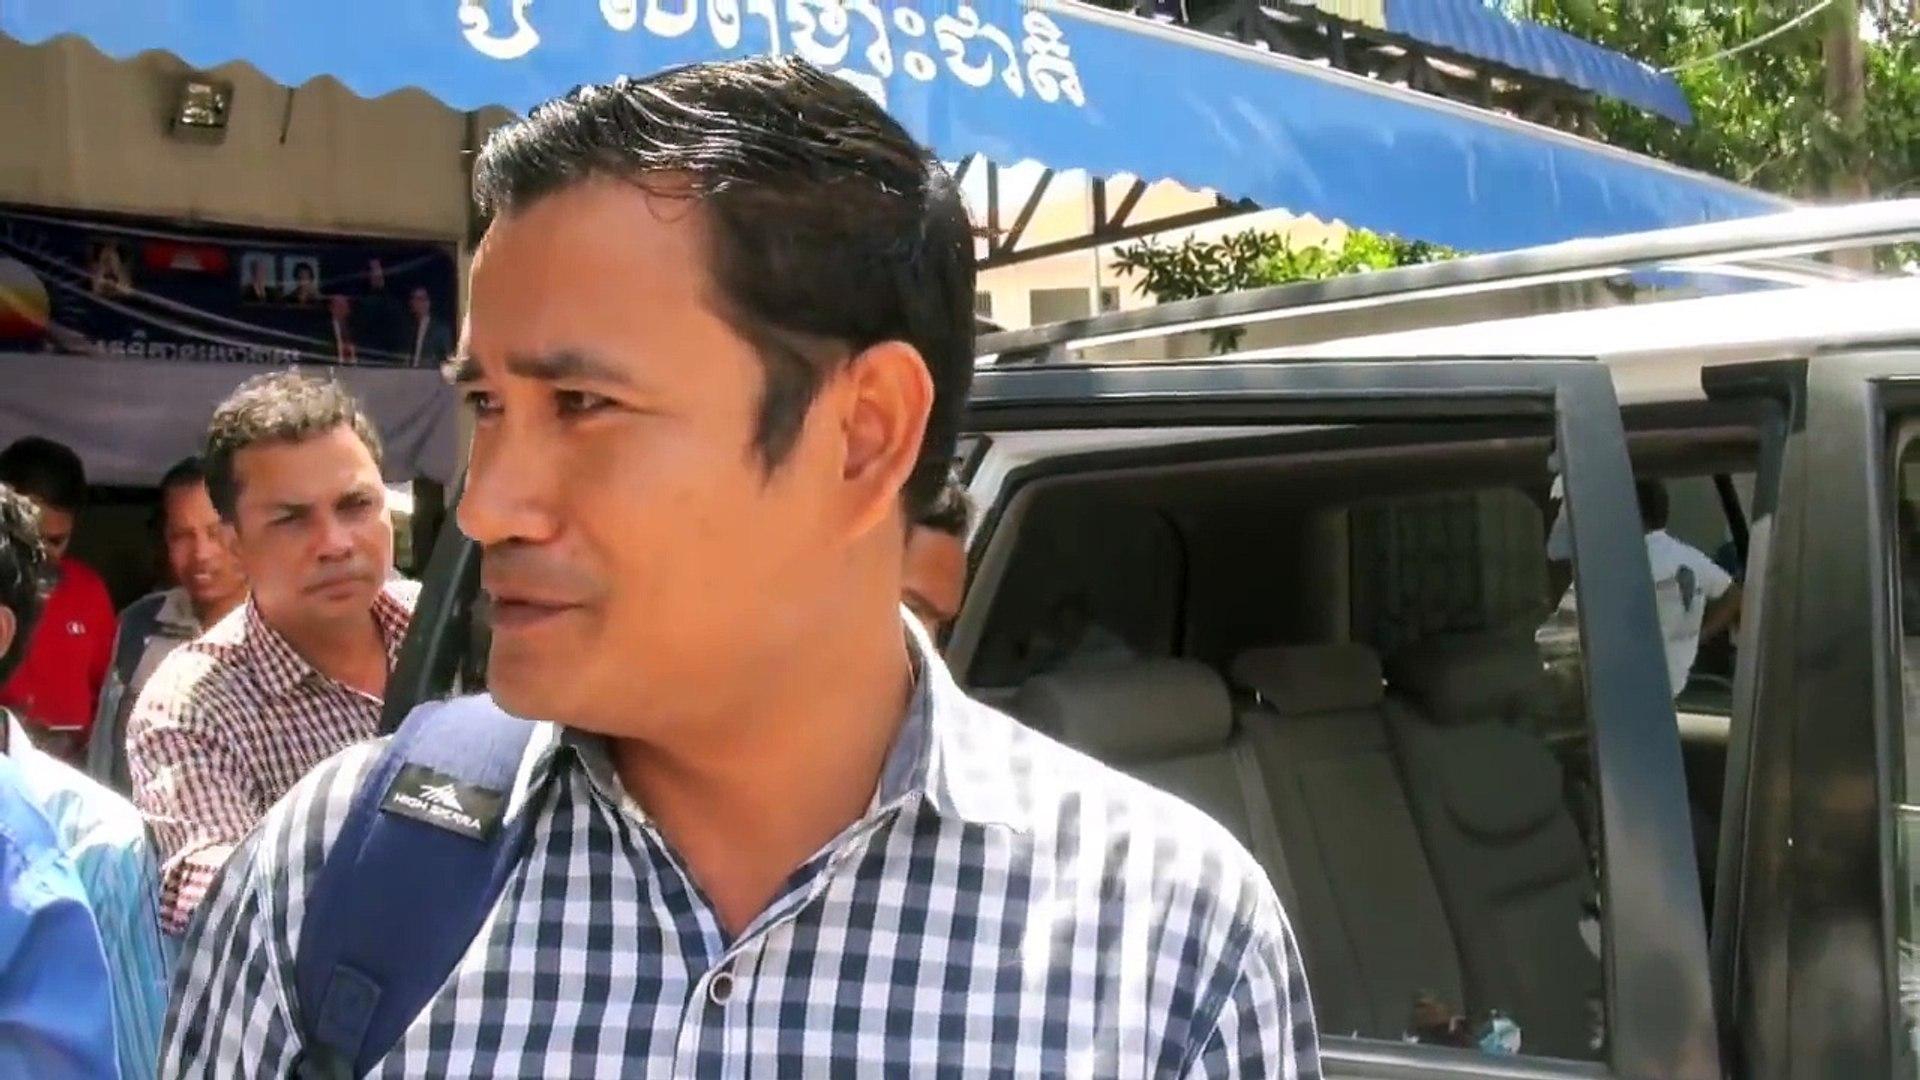 Sorn Dara Facebook News Today, Khmer Hot News, Cambodia Political News